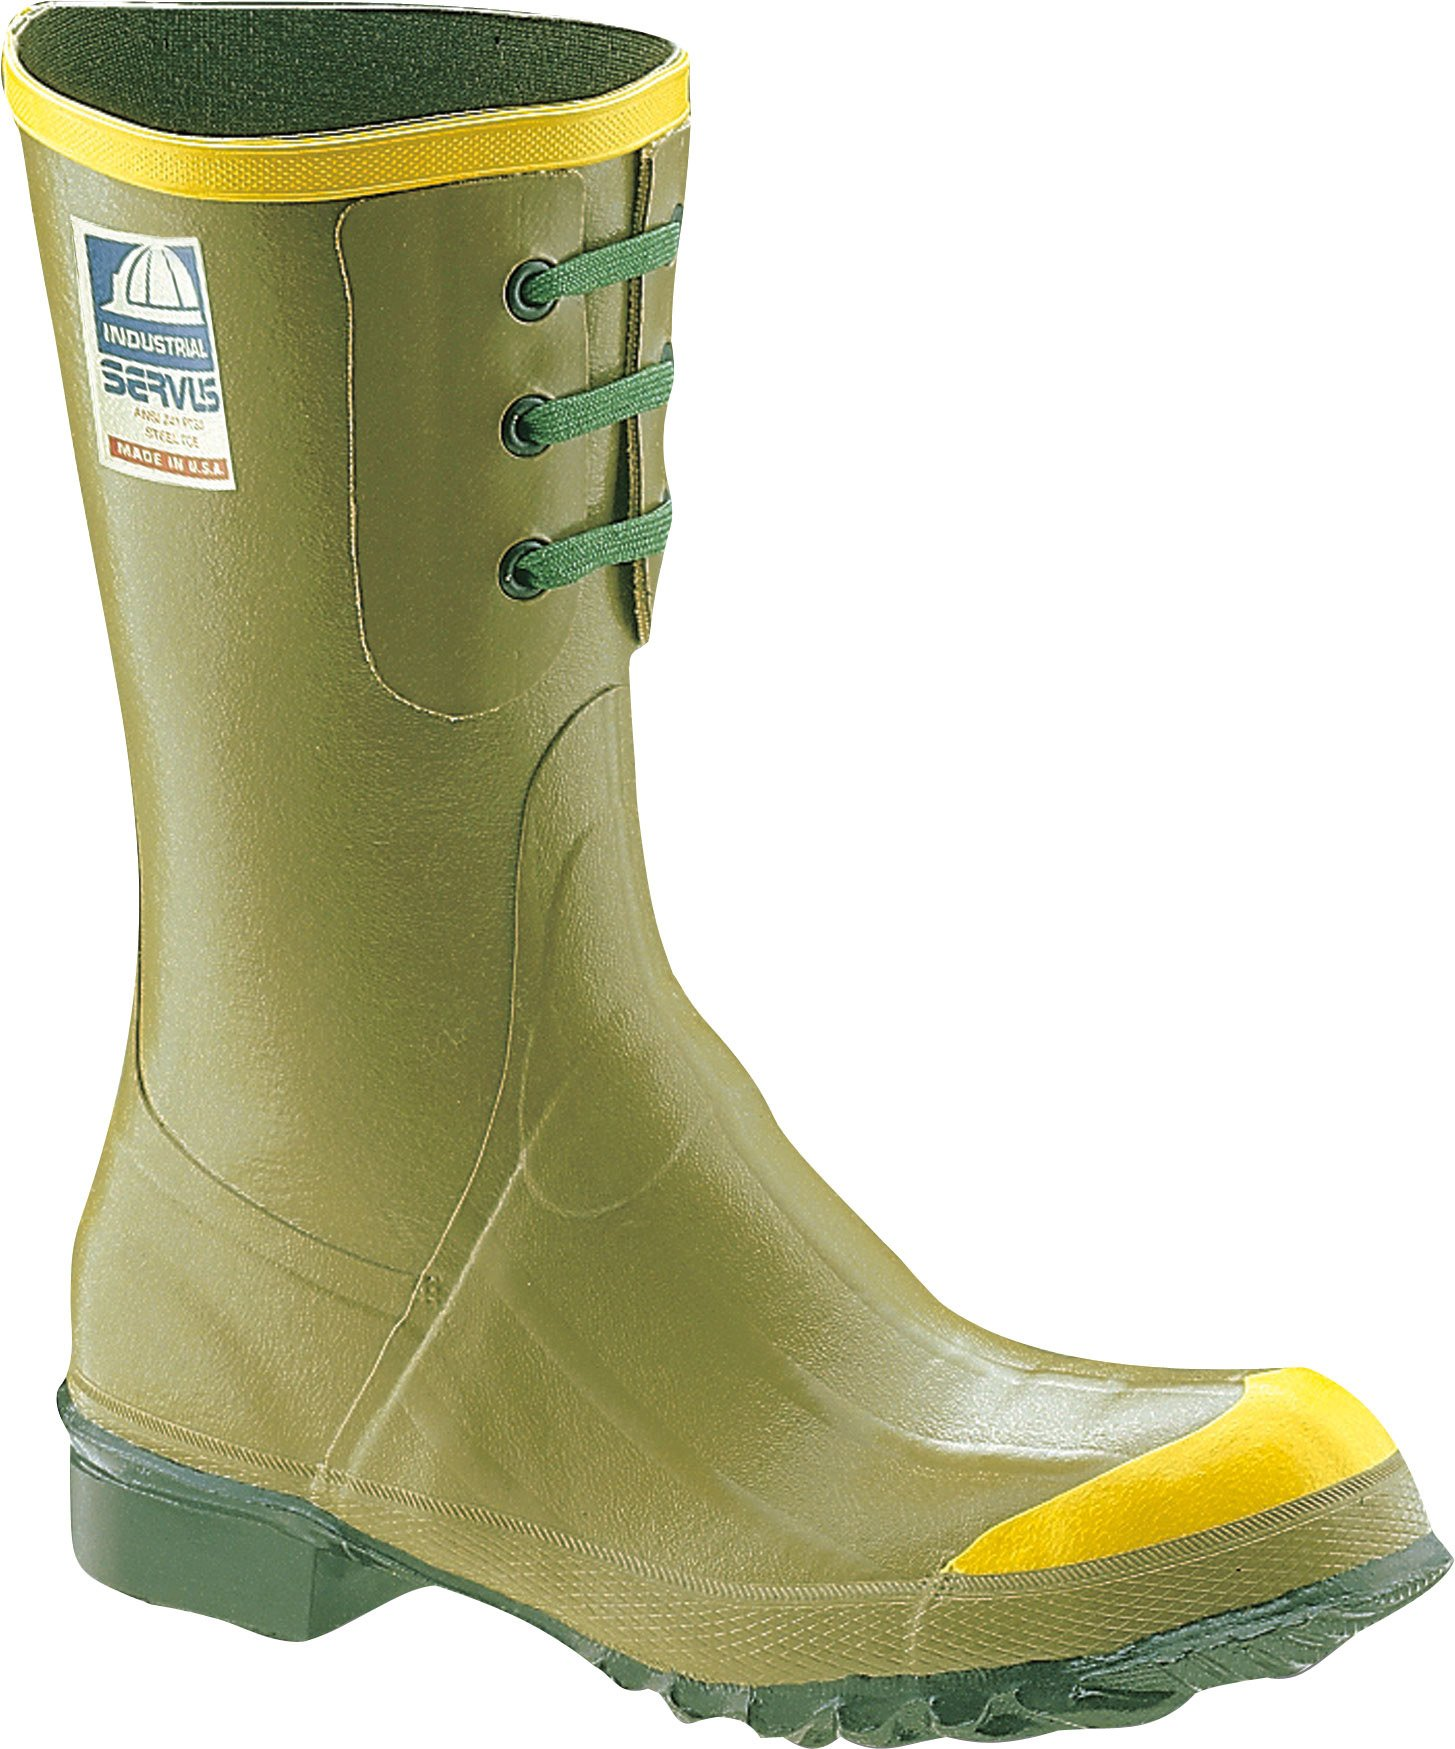 Ranger Engineer 12'' Heavy-Duty Men's Rubber Steel Toe Work Boots, Olive (21607)